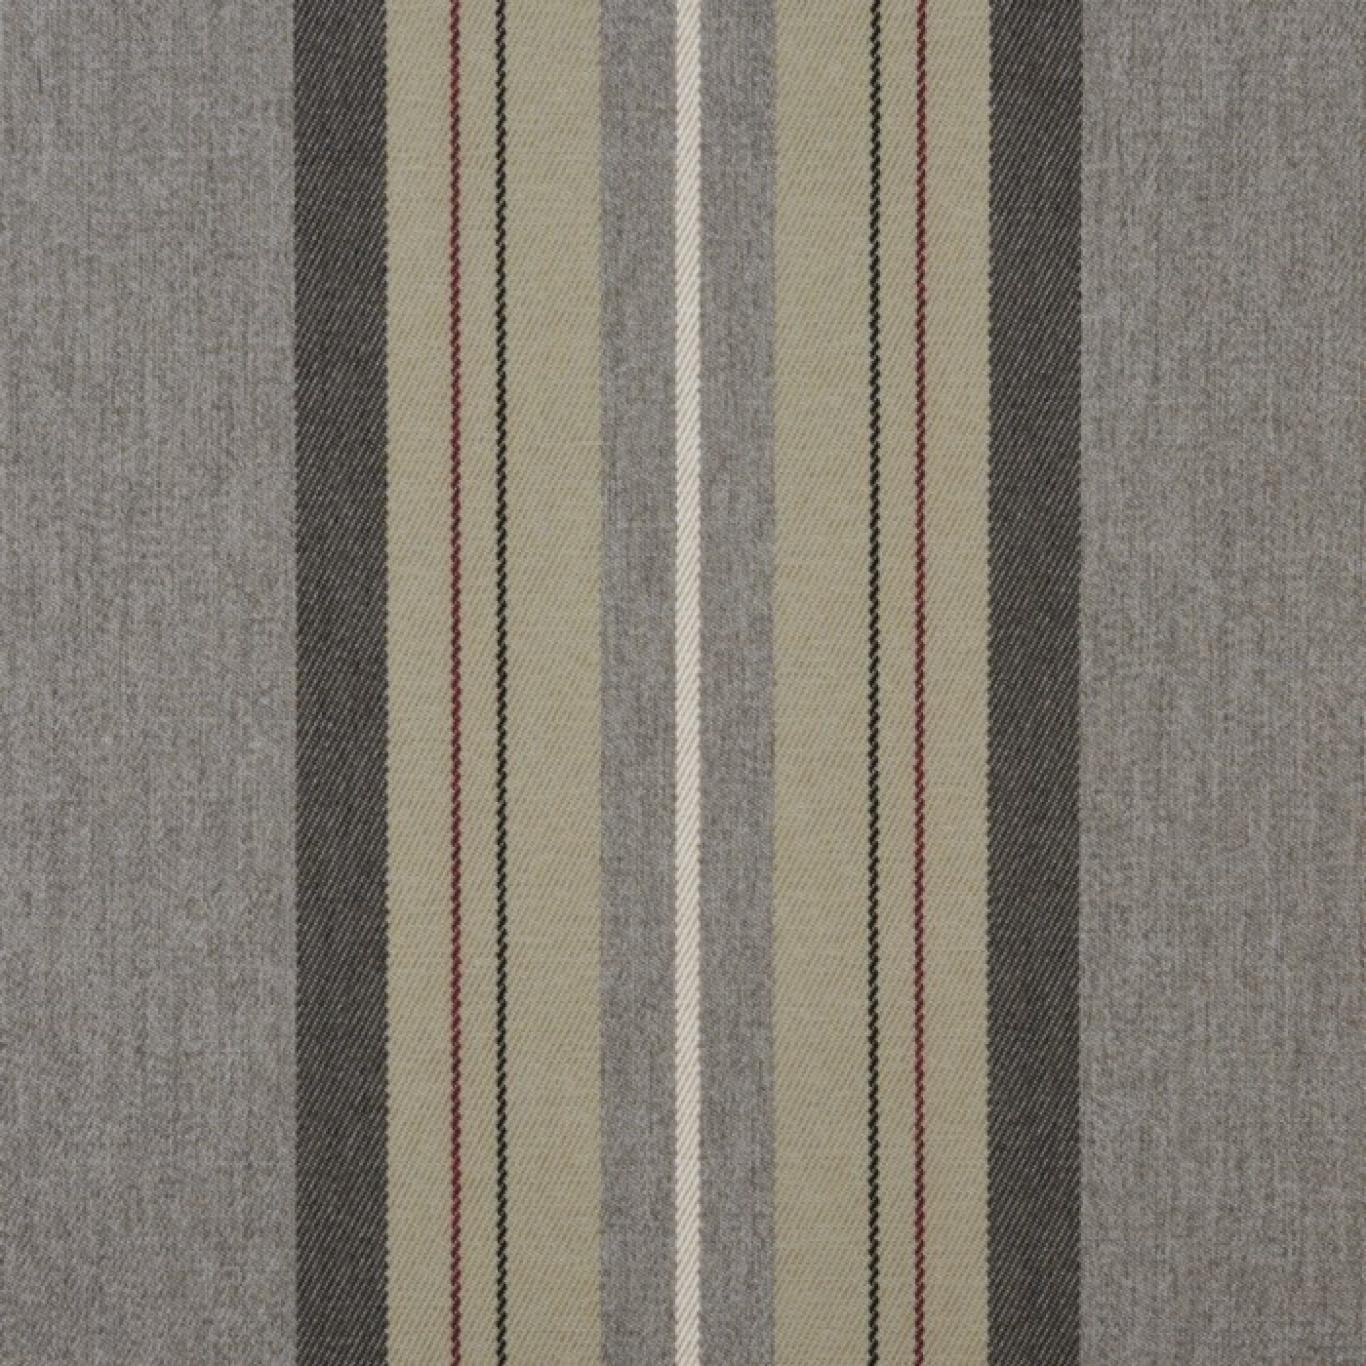 Image of Prestigious Glenfinnan Slate Fabric 3.6m Remnant